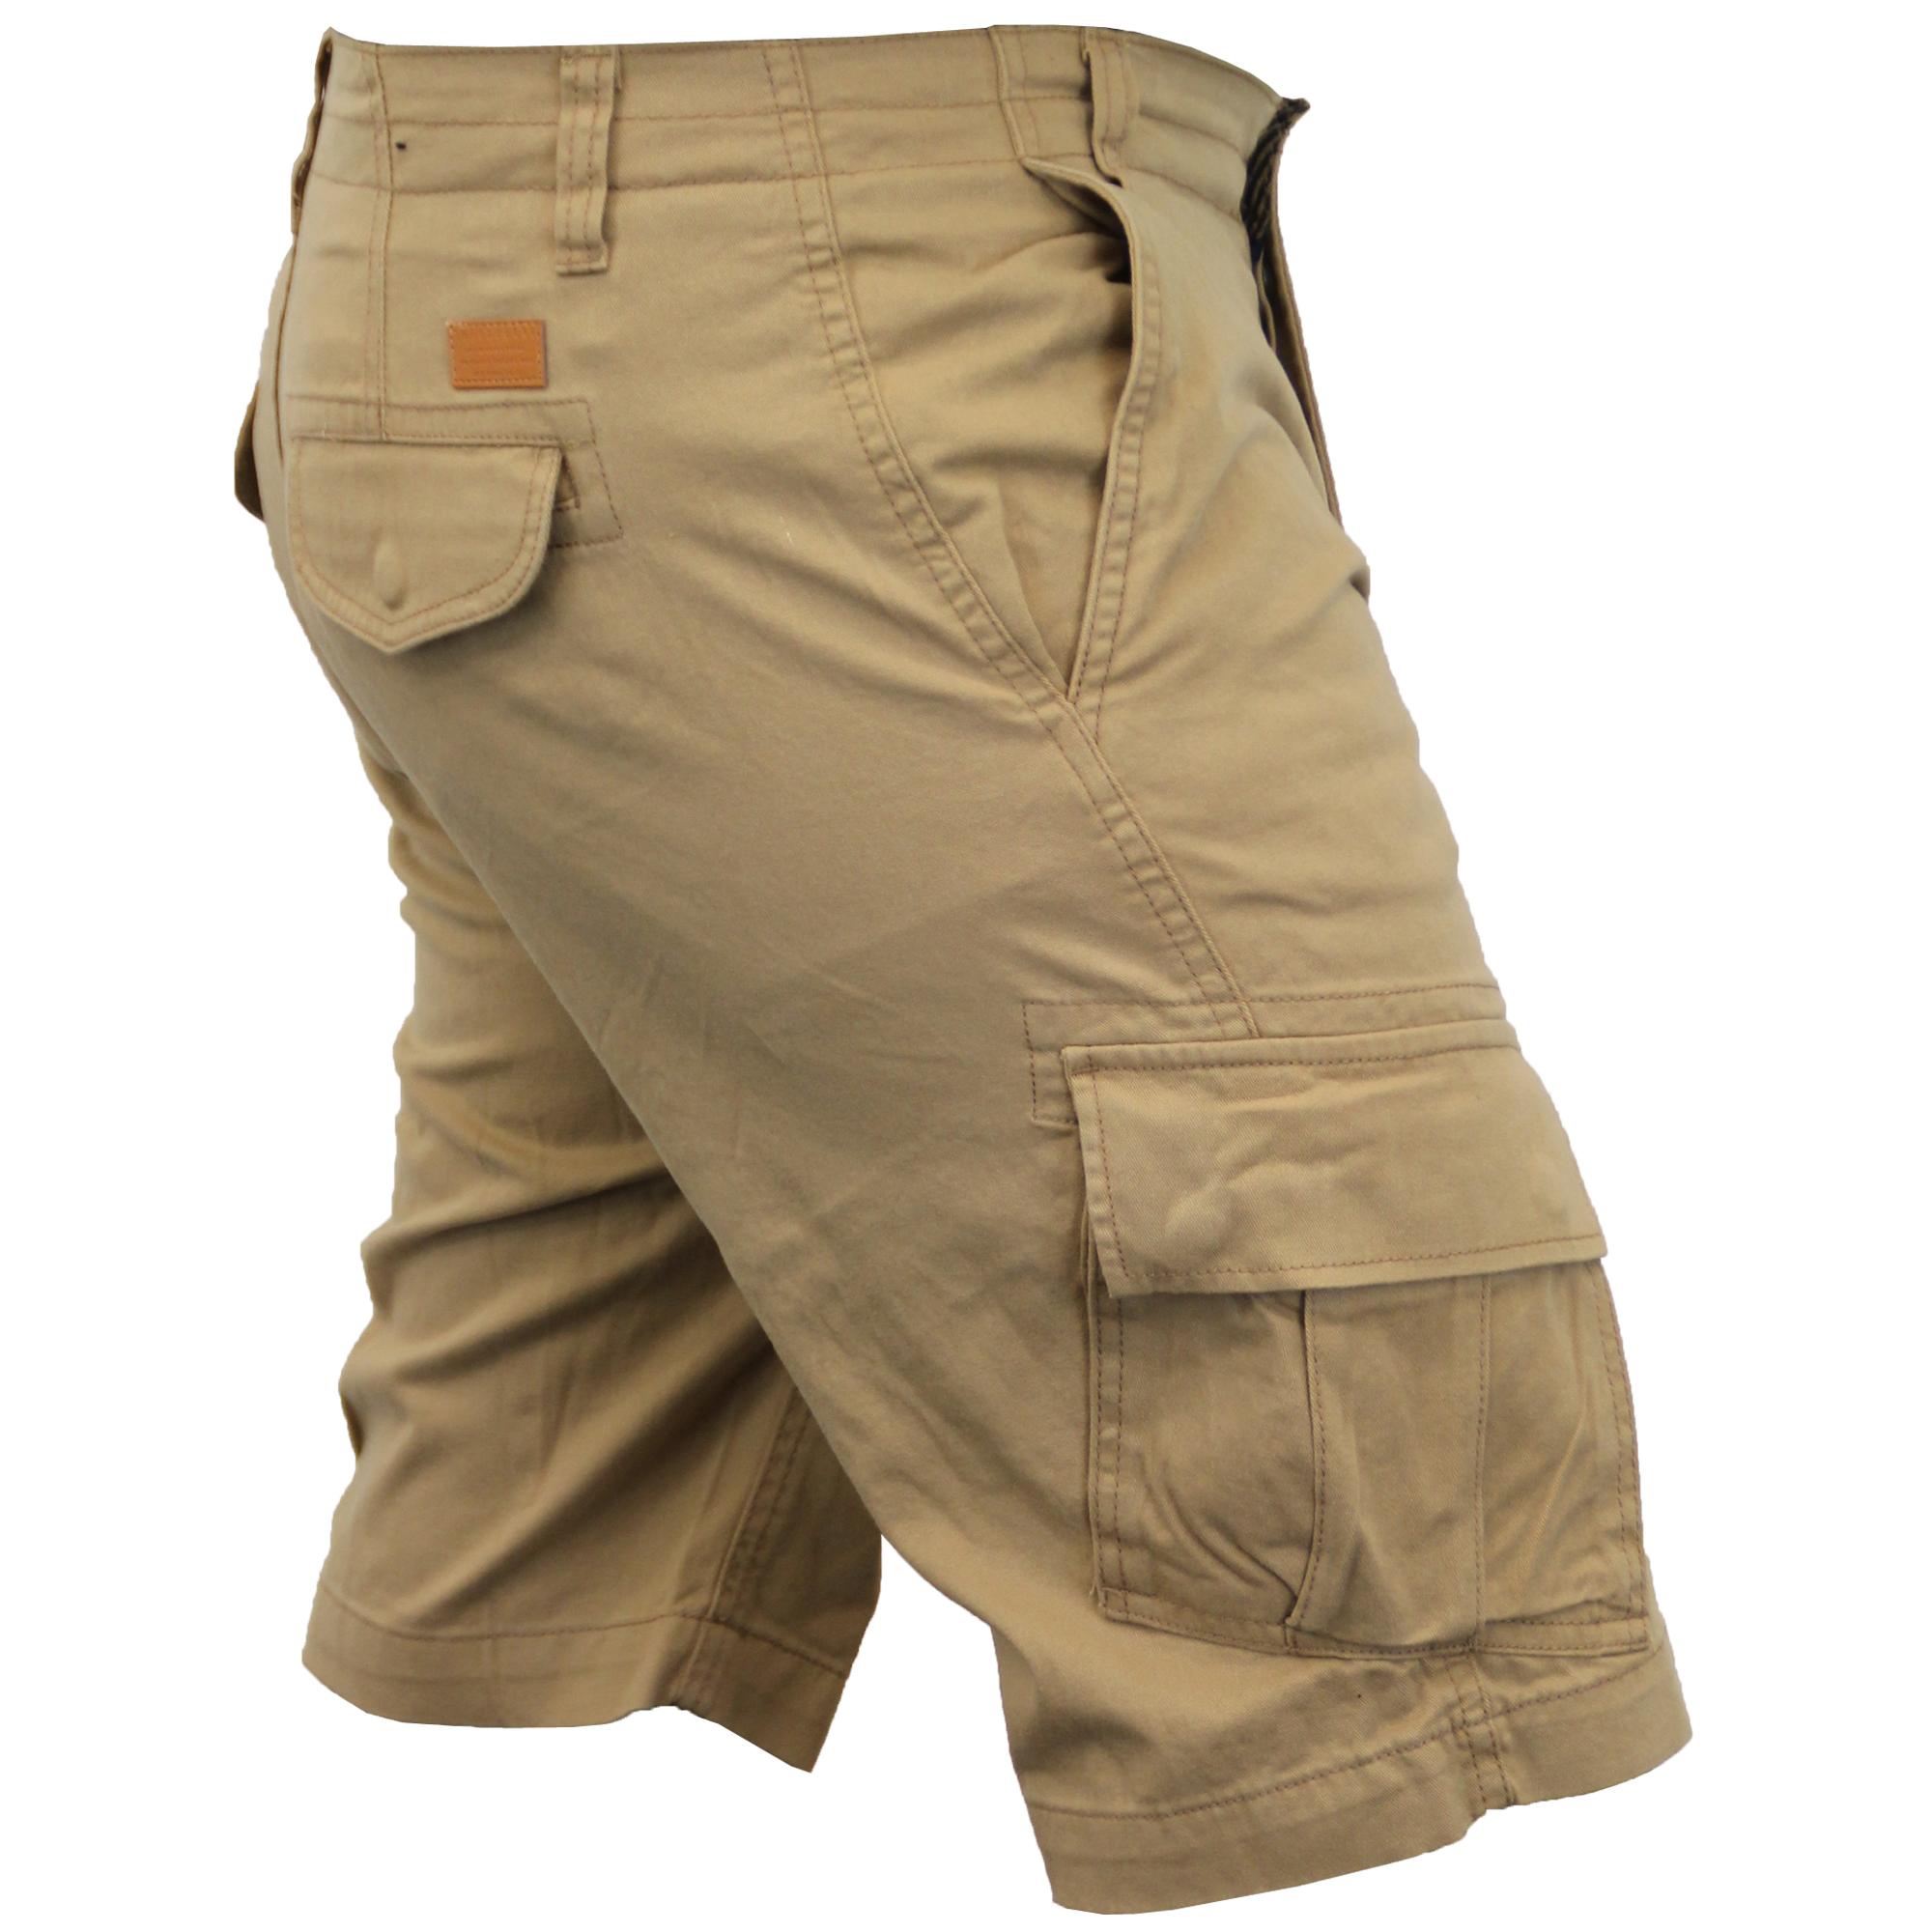 Mens-Cargo-Chino-Shorts-Threadbare-Combat-Knee-Length-Westace-Military-Summer thumbnail 22